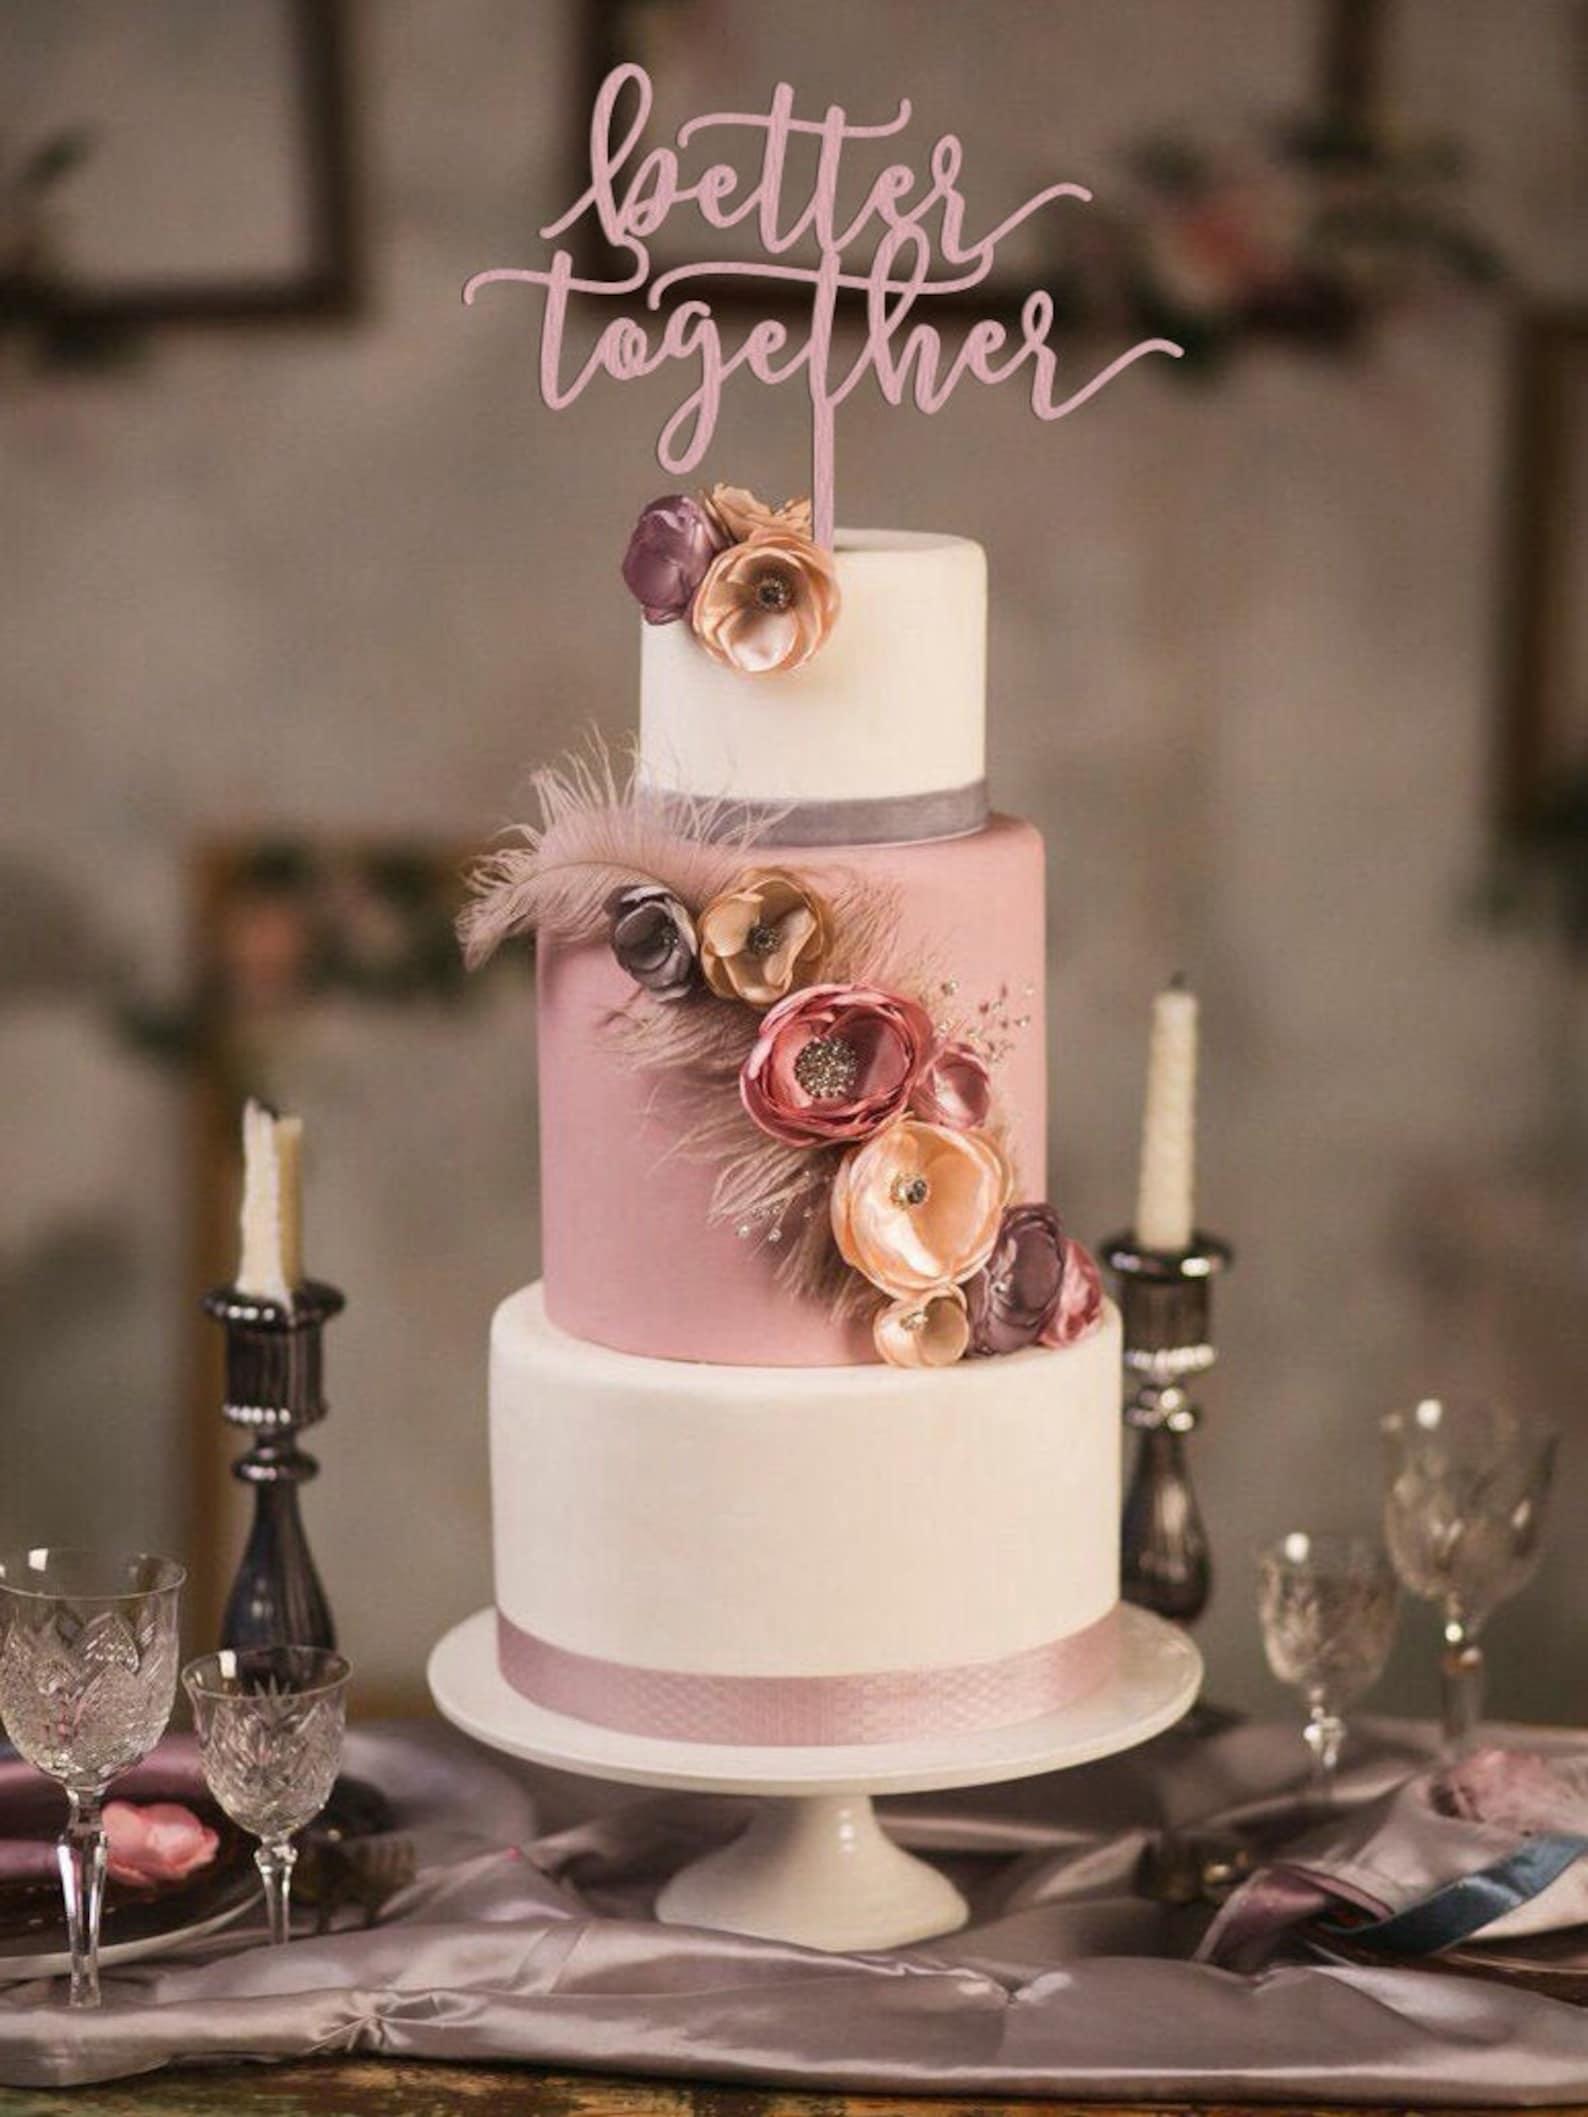 Better together Cake Topper